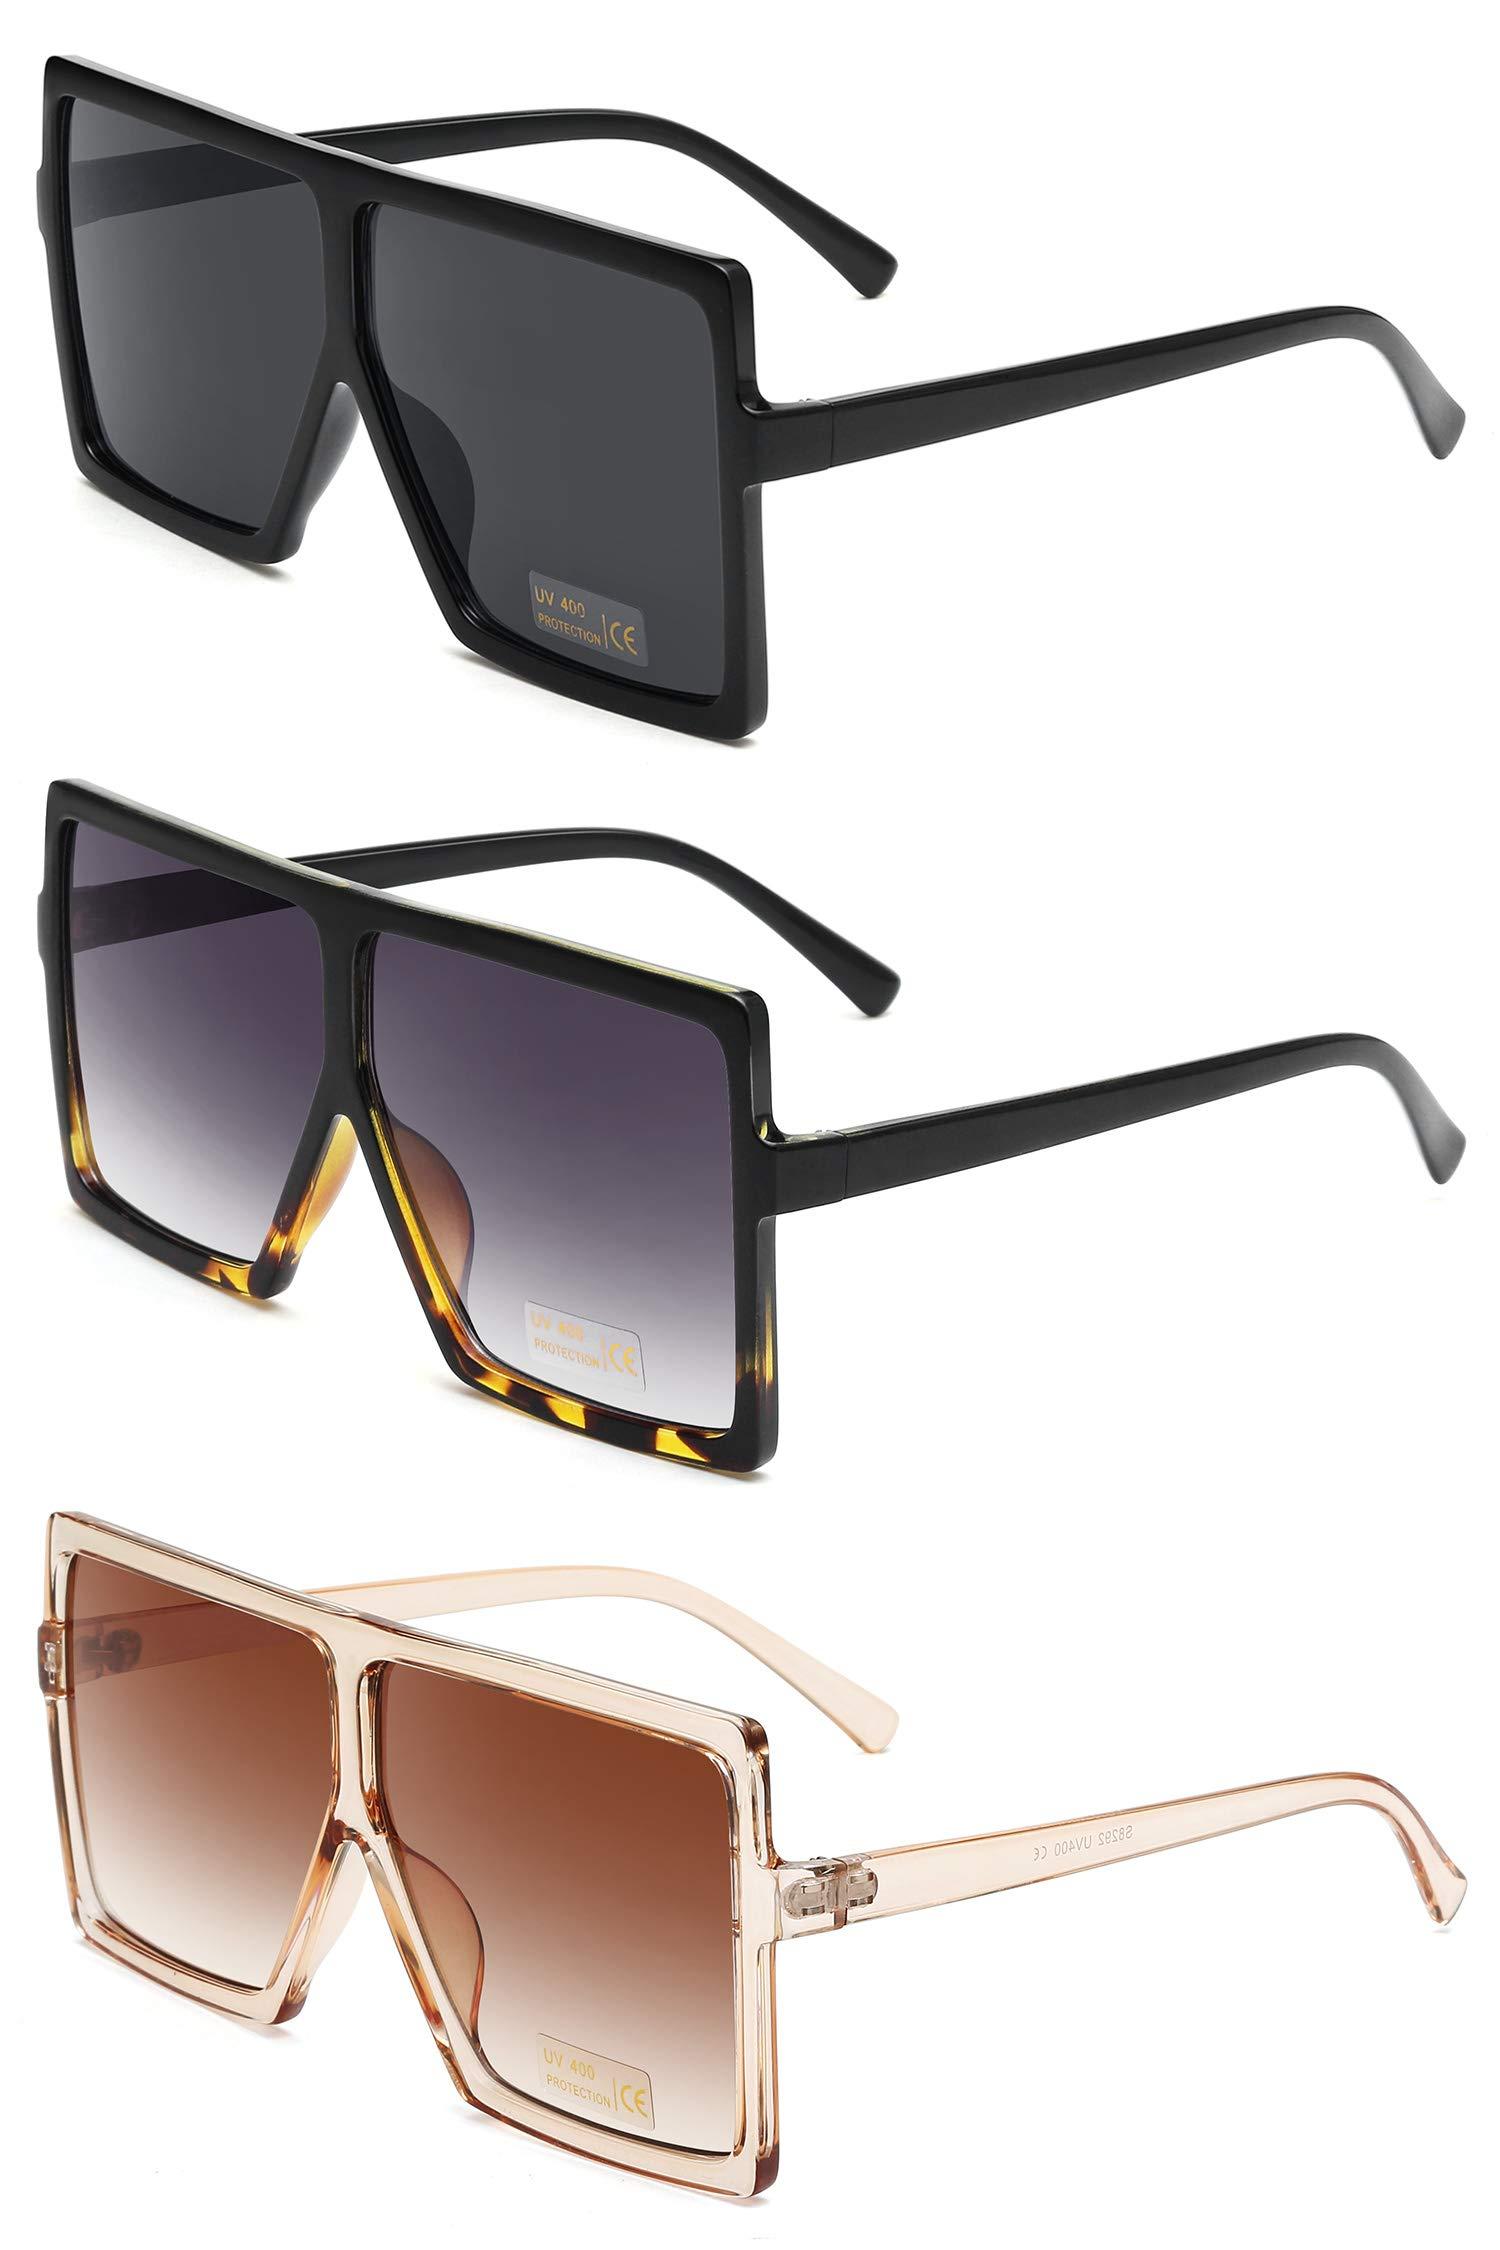 GRFISIA Square Oversized Sunglasses for Women Men Flat Top Fashion Shades (3PCS-Black- leopard-orange, 2.56)